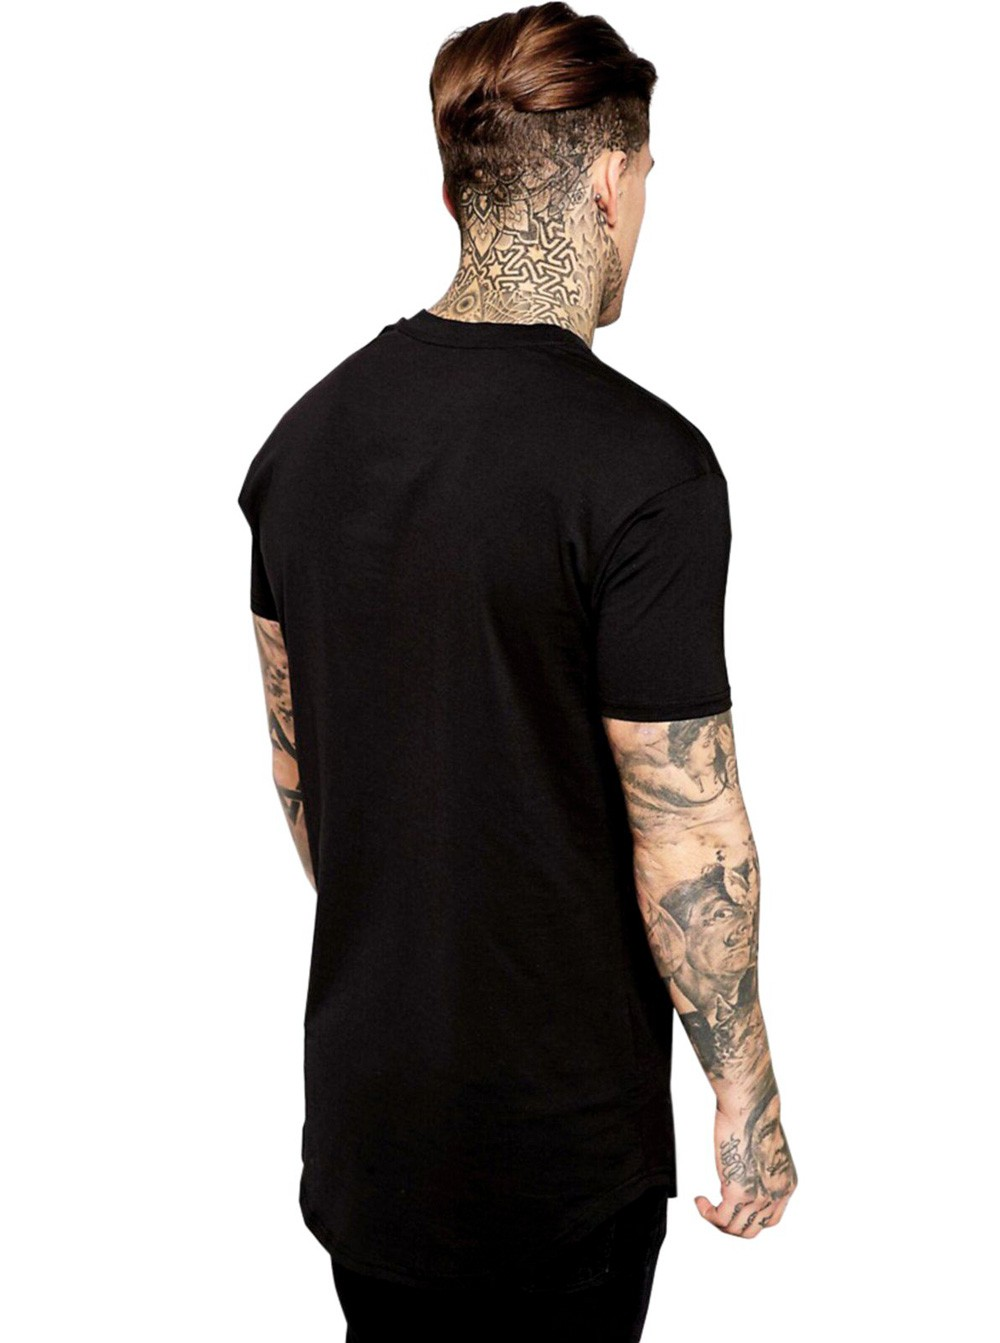 Camiseta Masculina Oversized Long Line Retrô Fita K7 ER_147